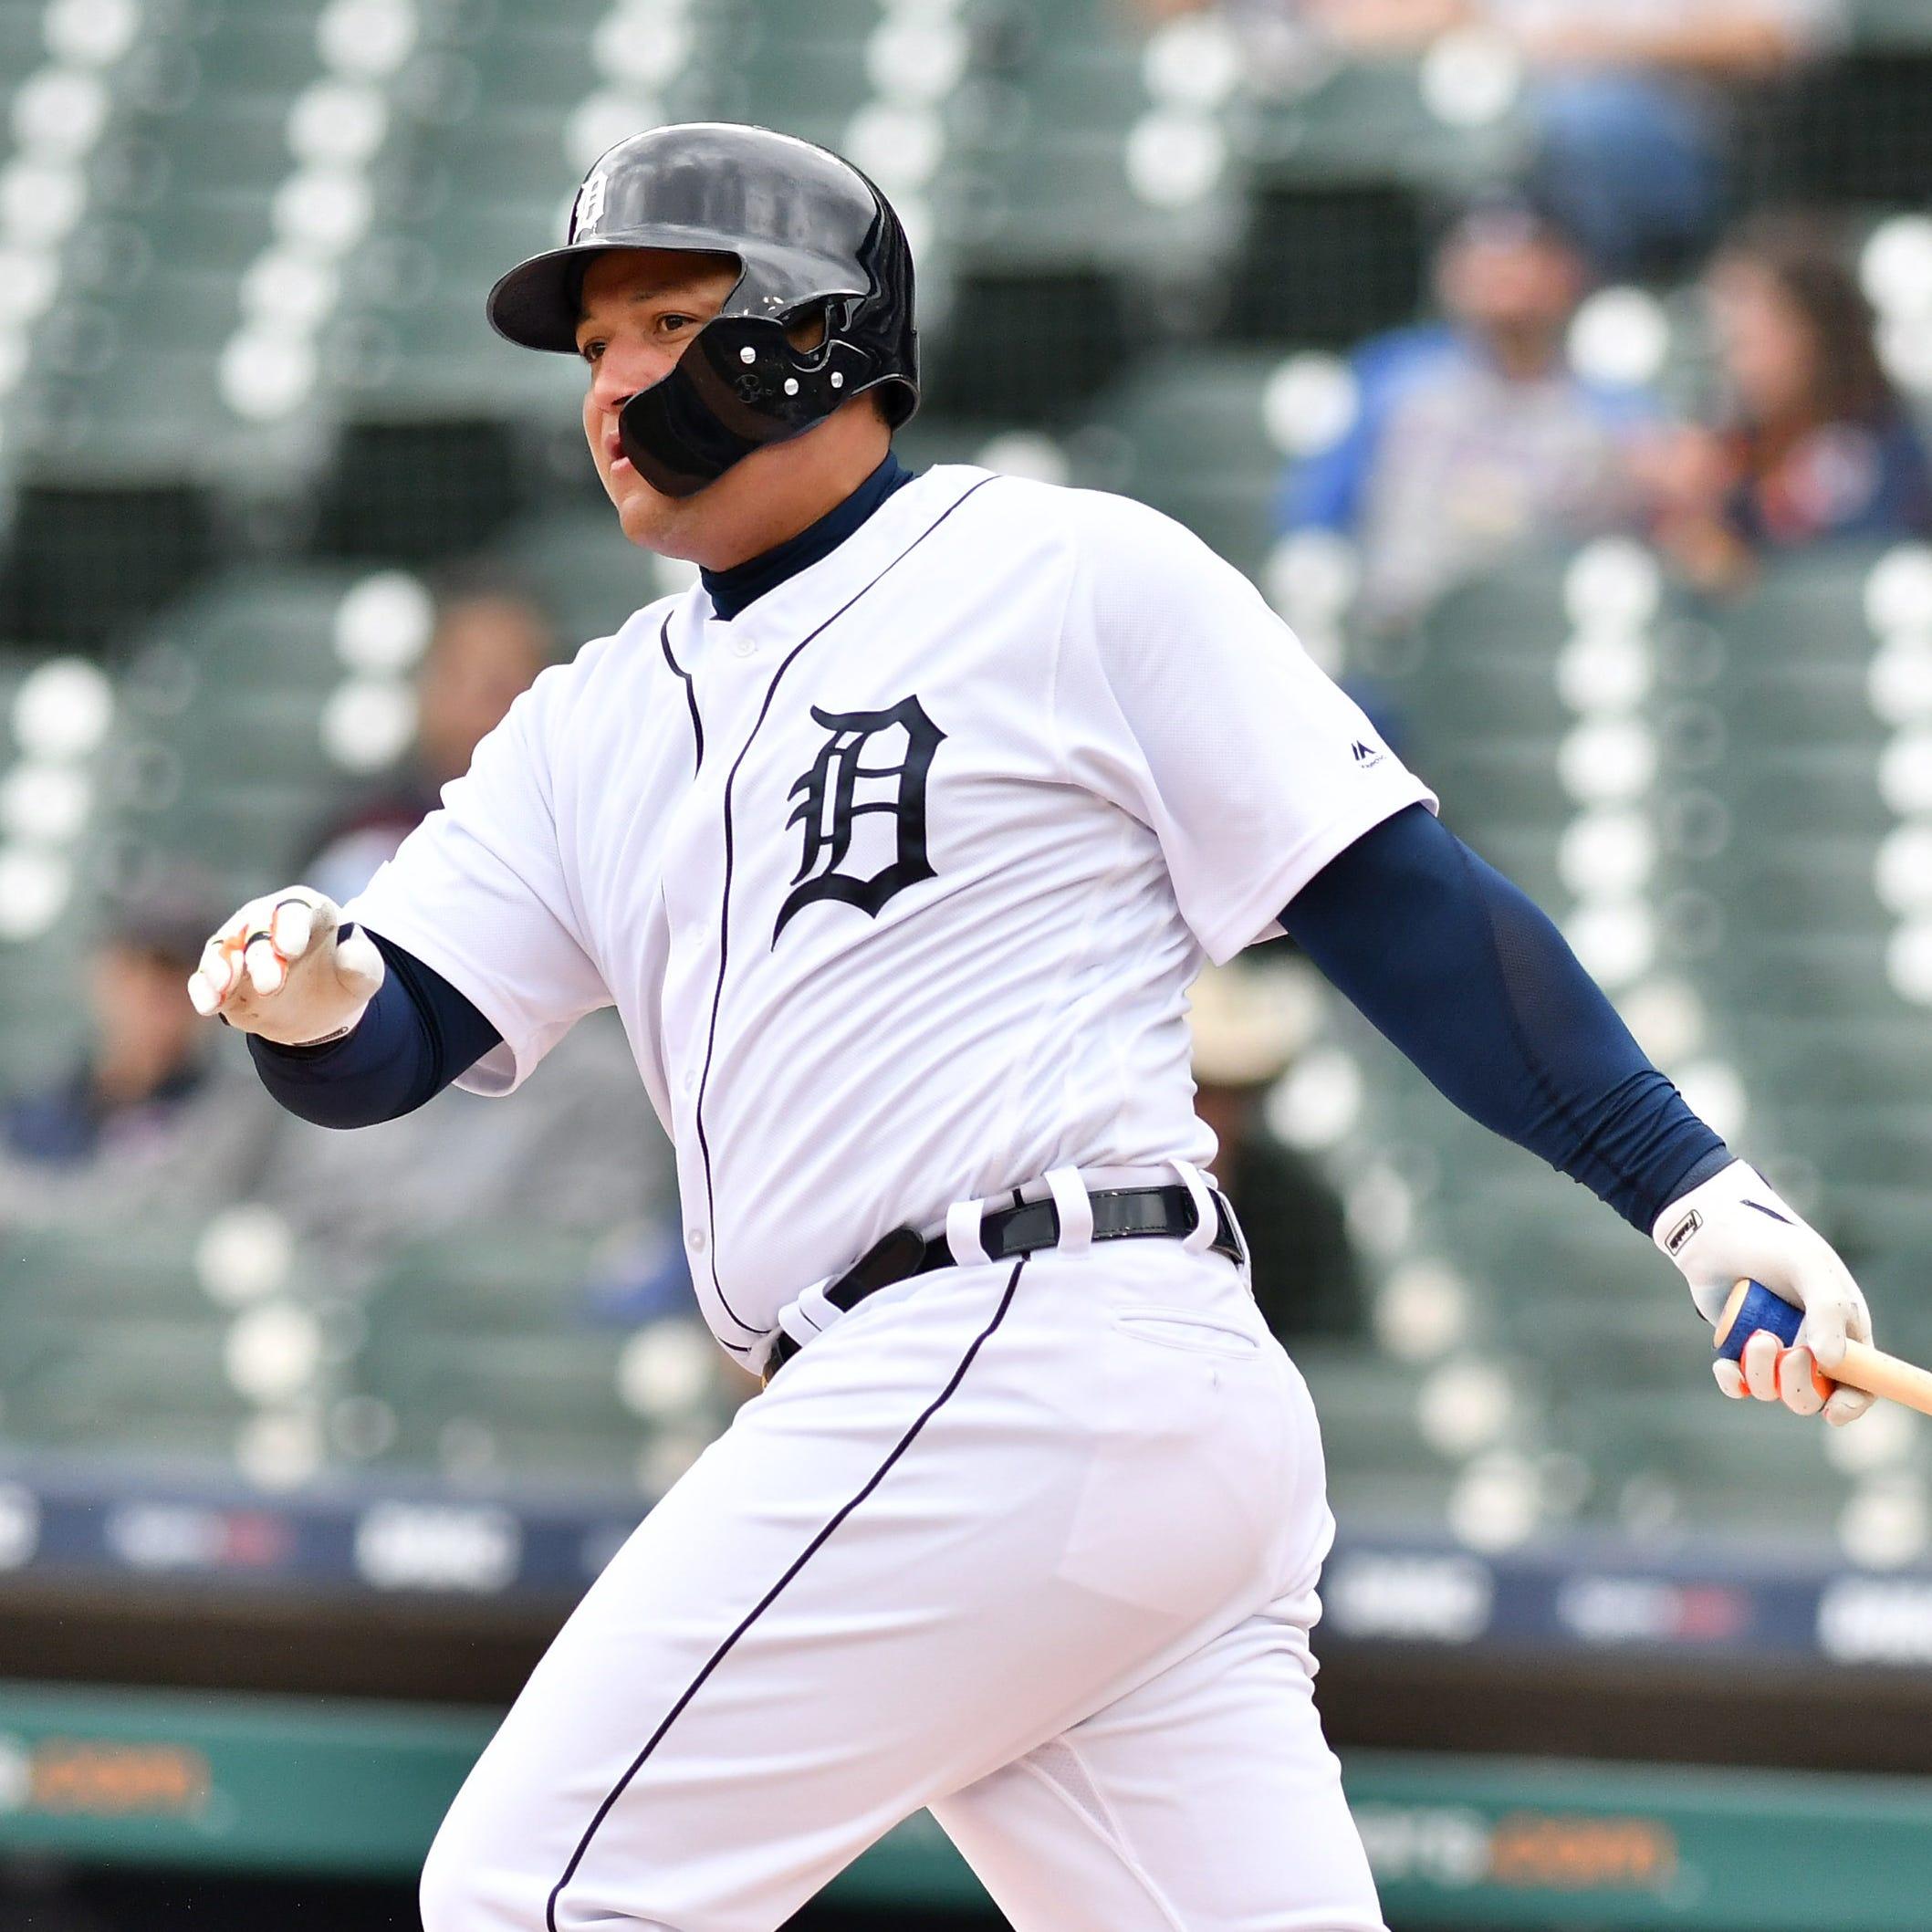 Miguel Cabrera, Nick Castellanos help Tigers vanquish five-game skid